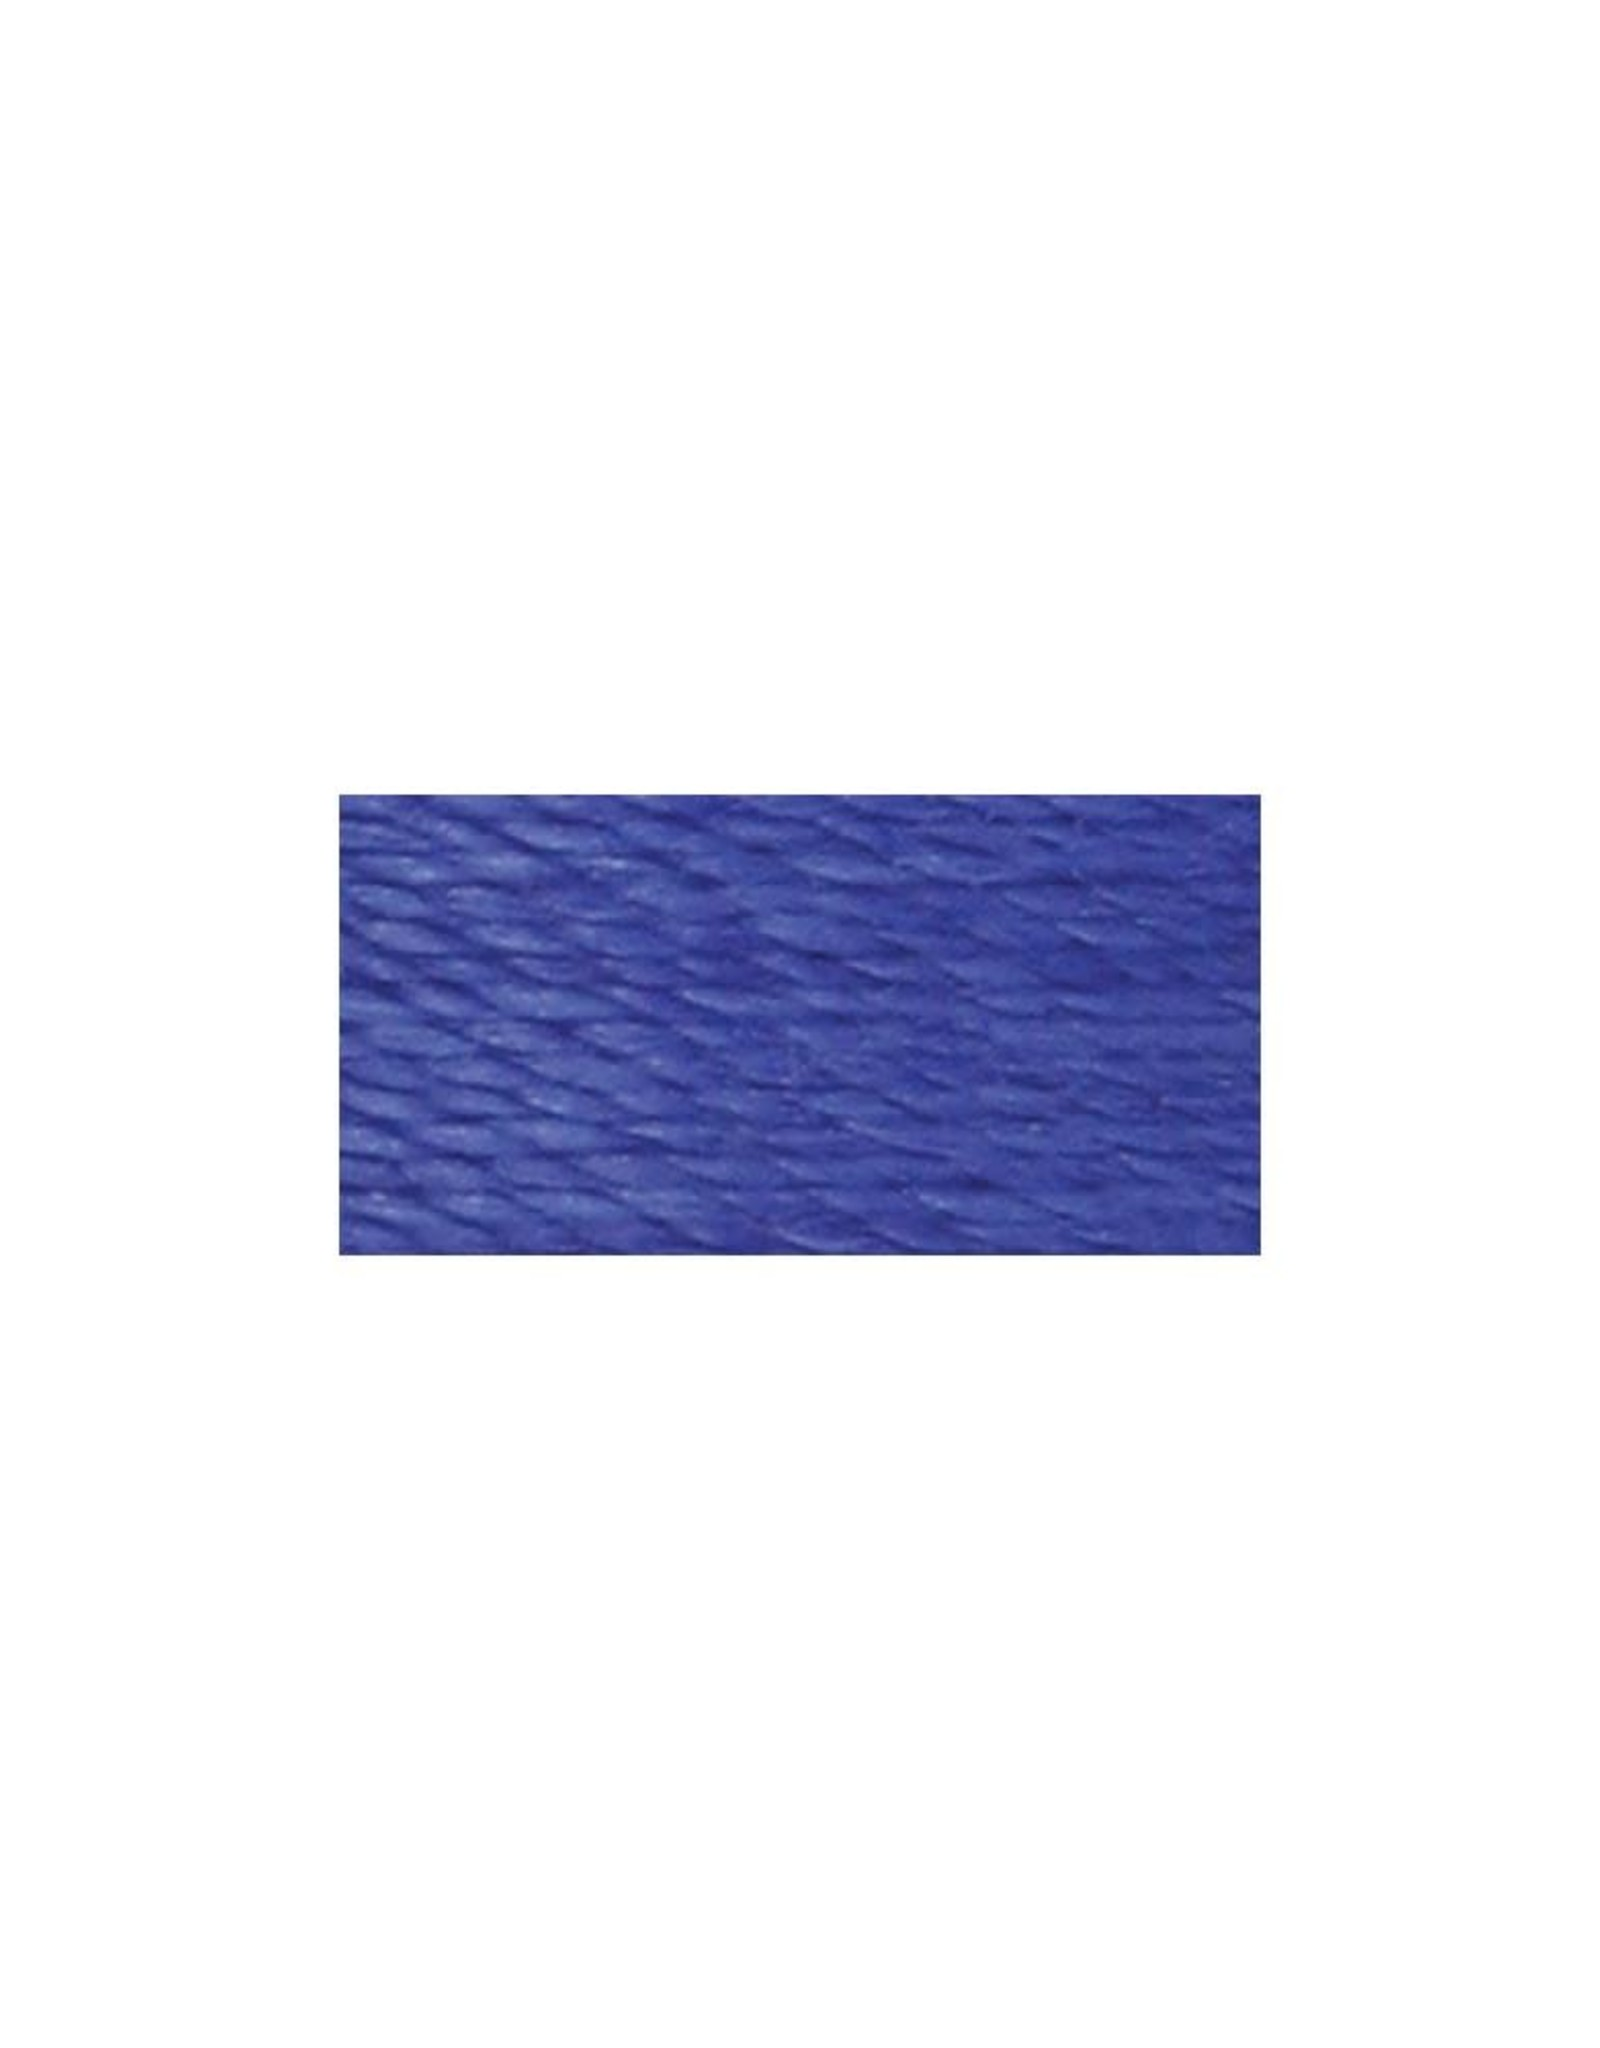 Dual Duty XP General Purpose Thread 250yd, Crayon Blue